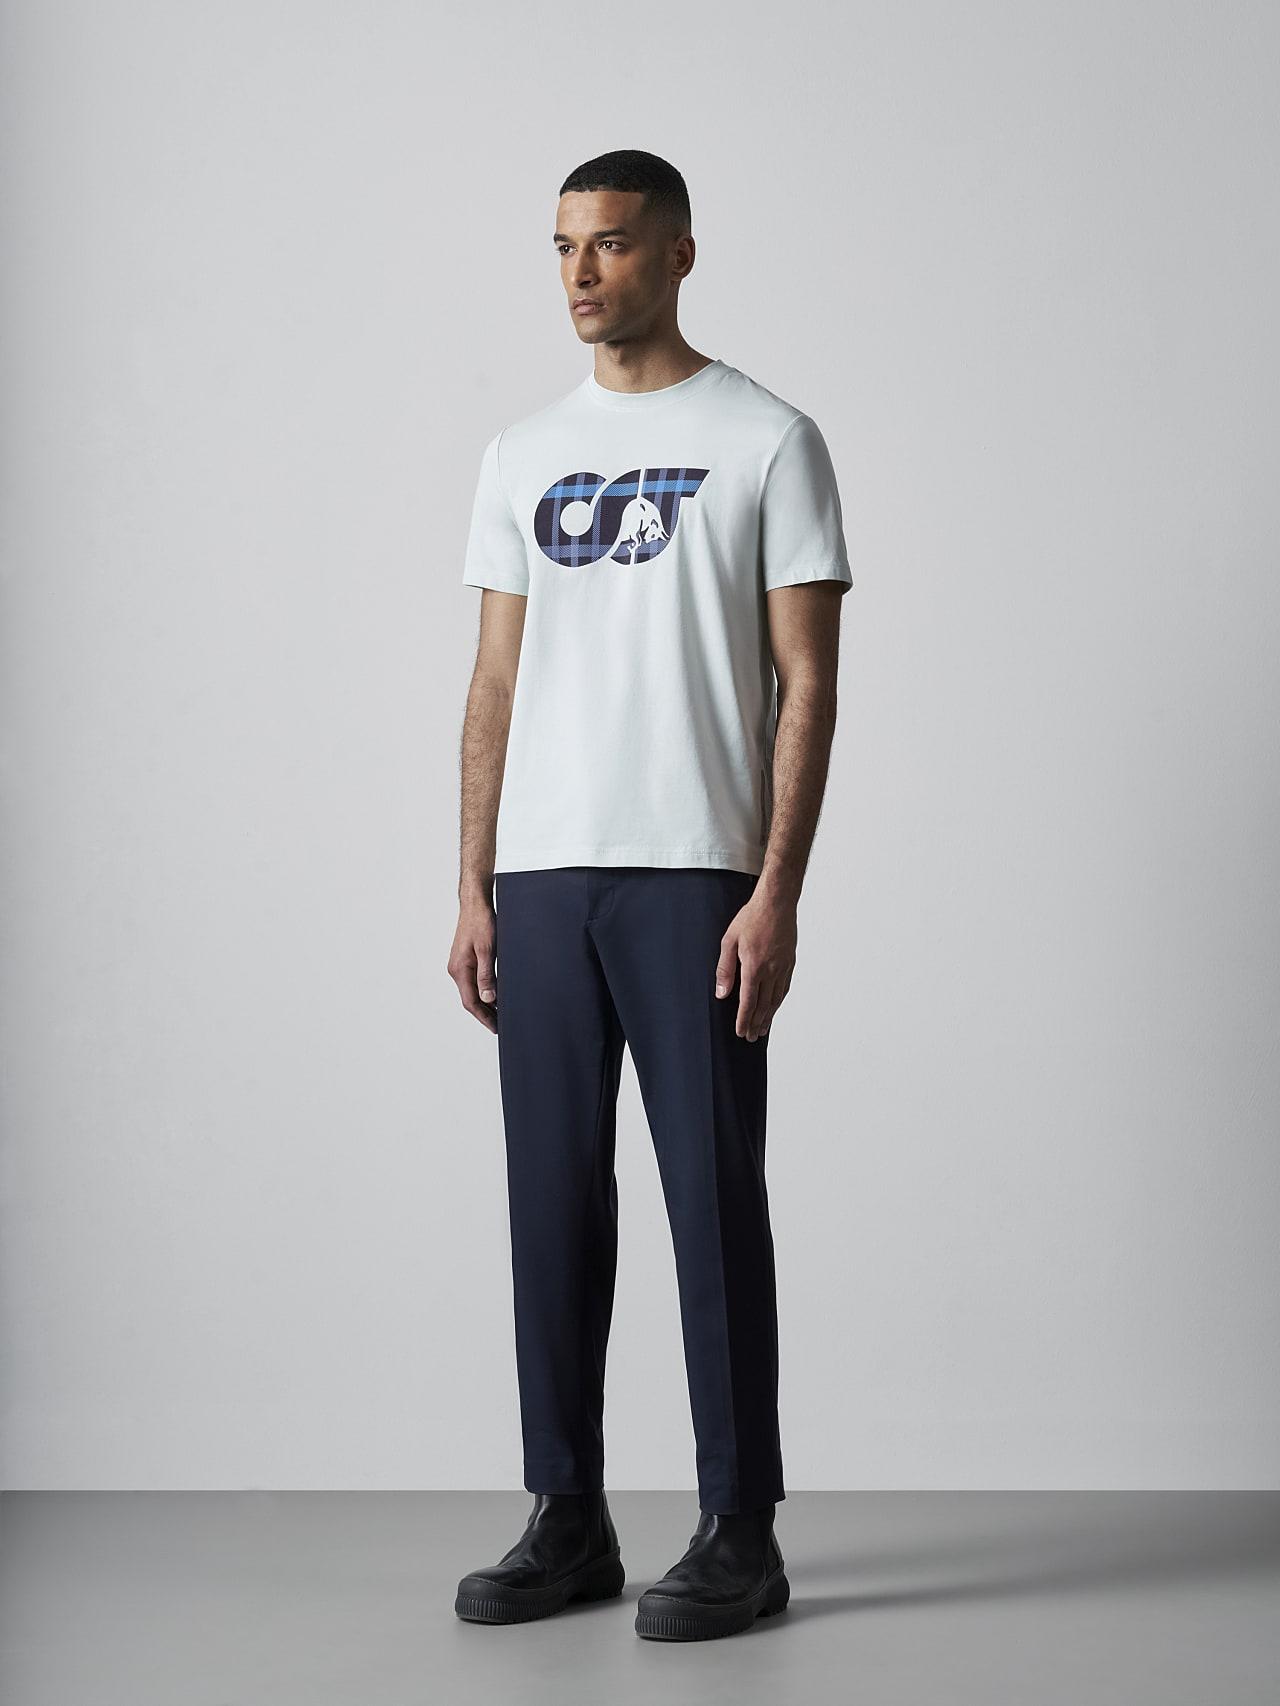 JABIS V1.Y5.02 Logo Print T-Shirt Pale Blue  Front Alpha Tauri